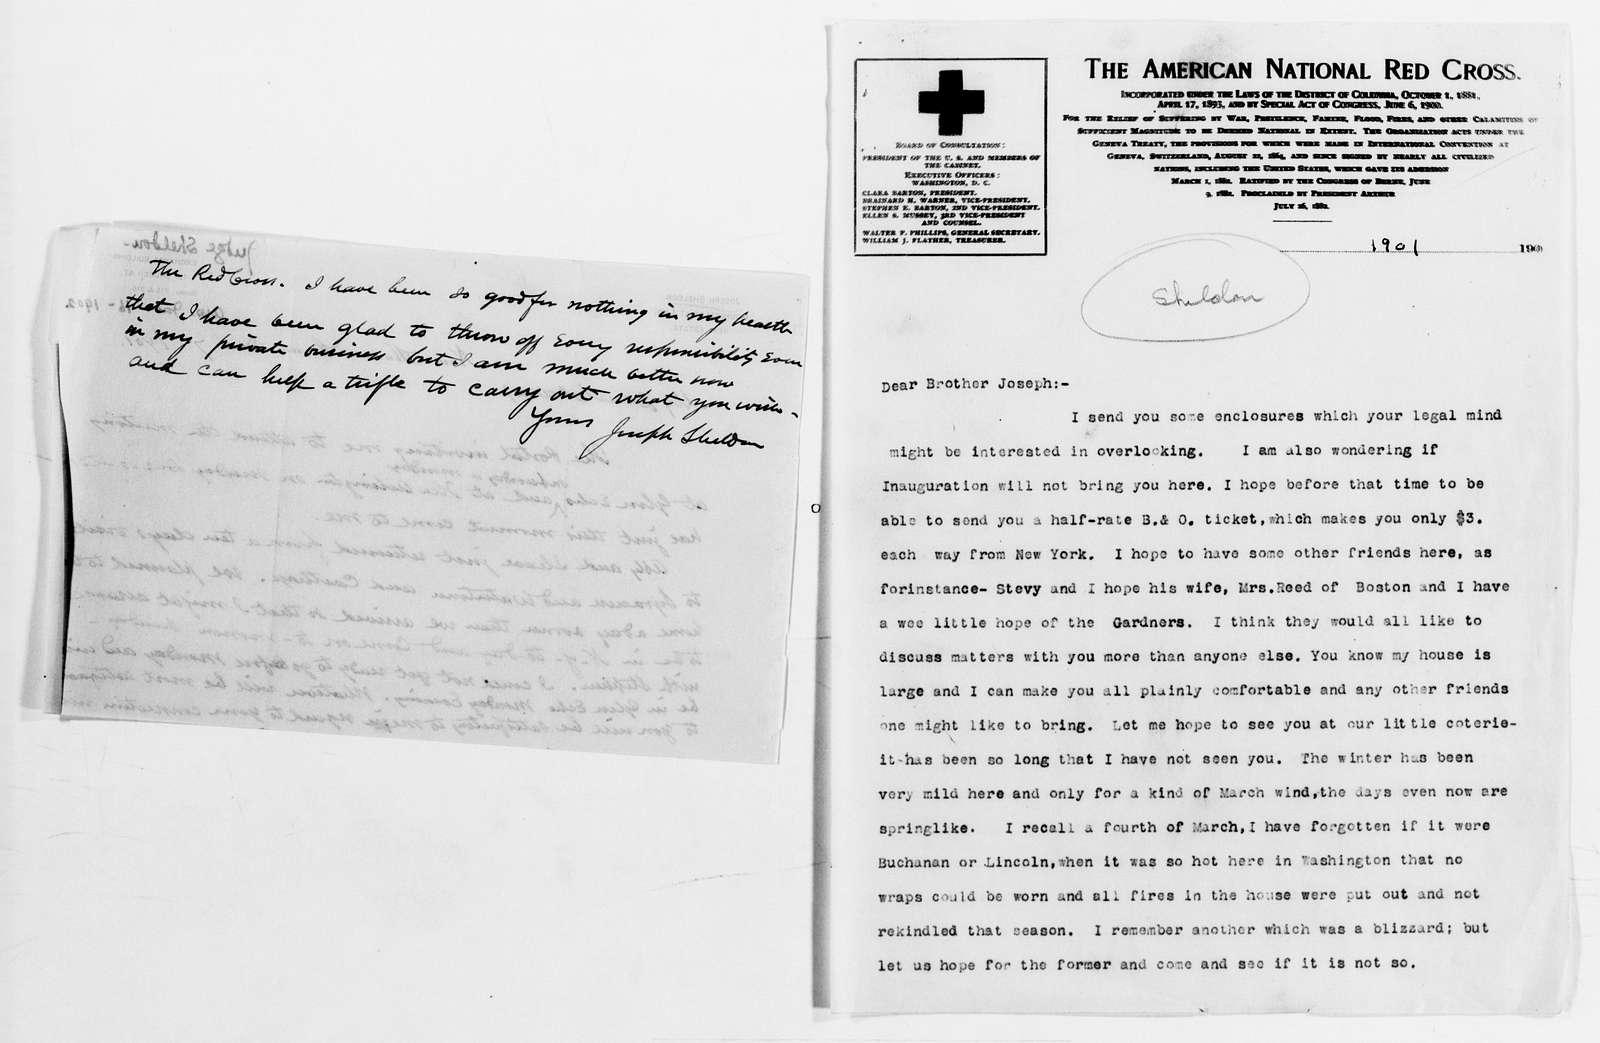 Clara Barton Papers: General Correspondence, 1838-1912; Sheldon, Joseph and Abby, 1868-1904